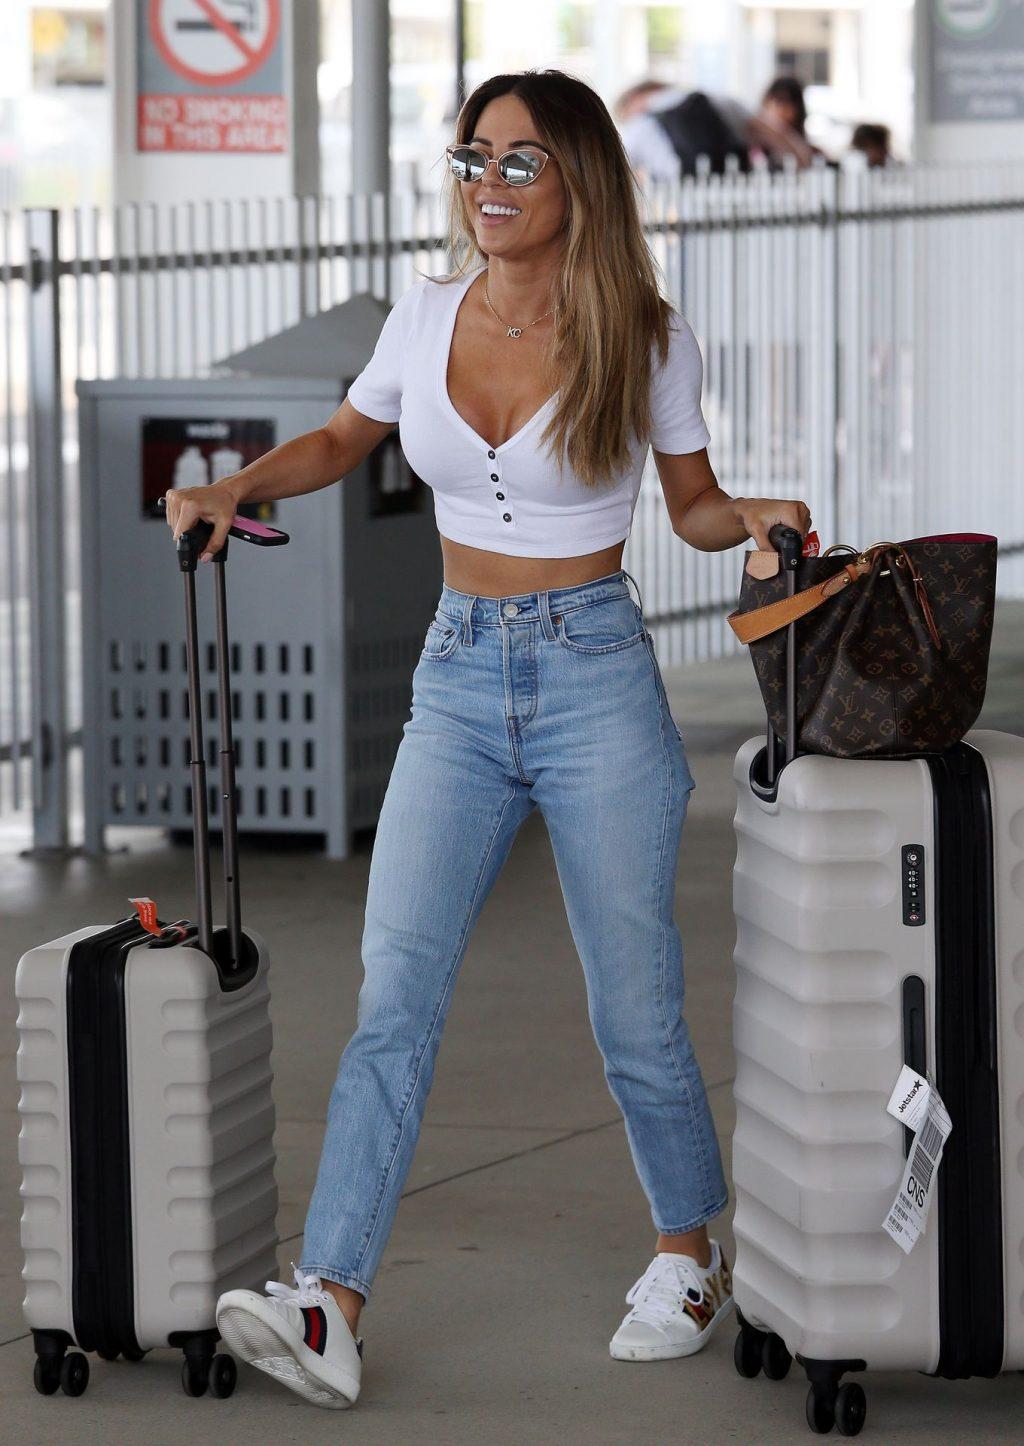 MAFS KC Osborne Arrives in Cairns on Holiday (33 Photos)